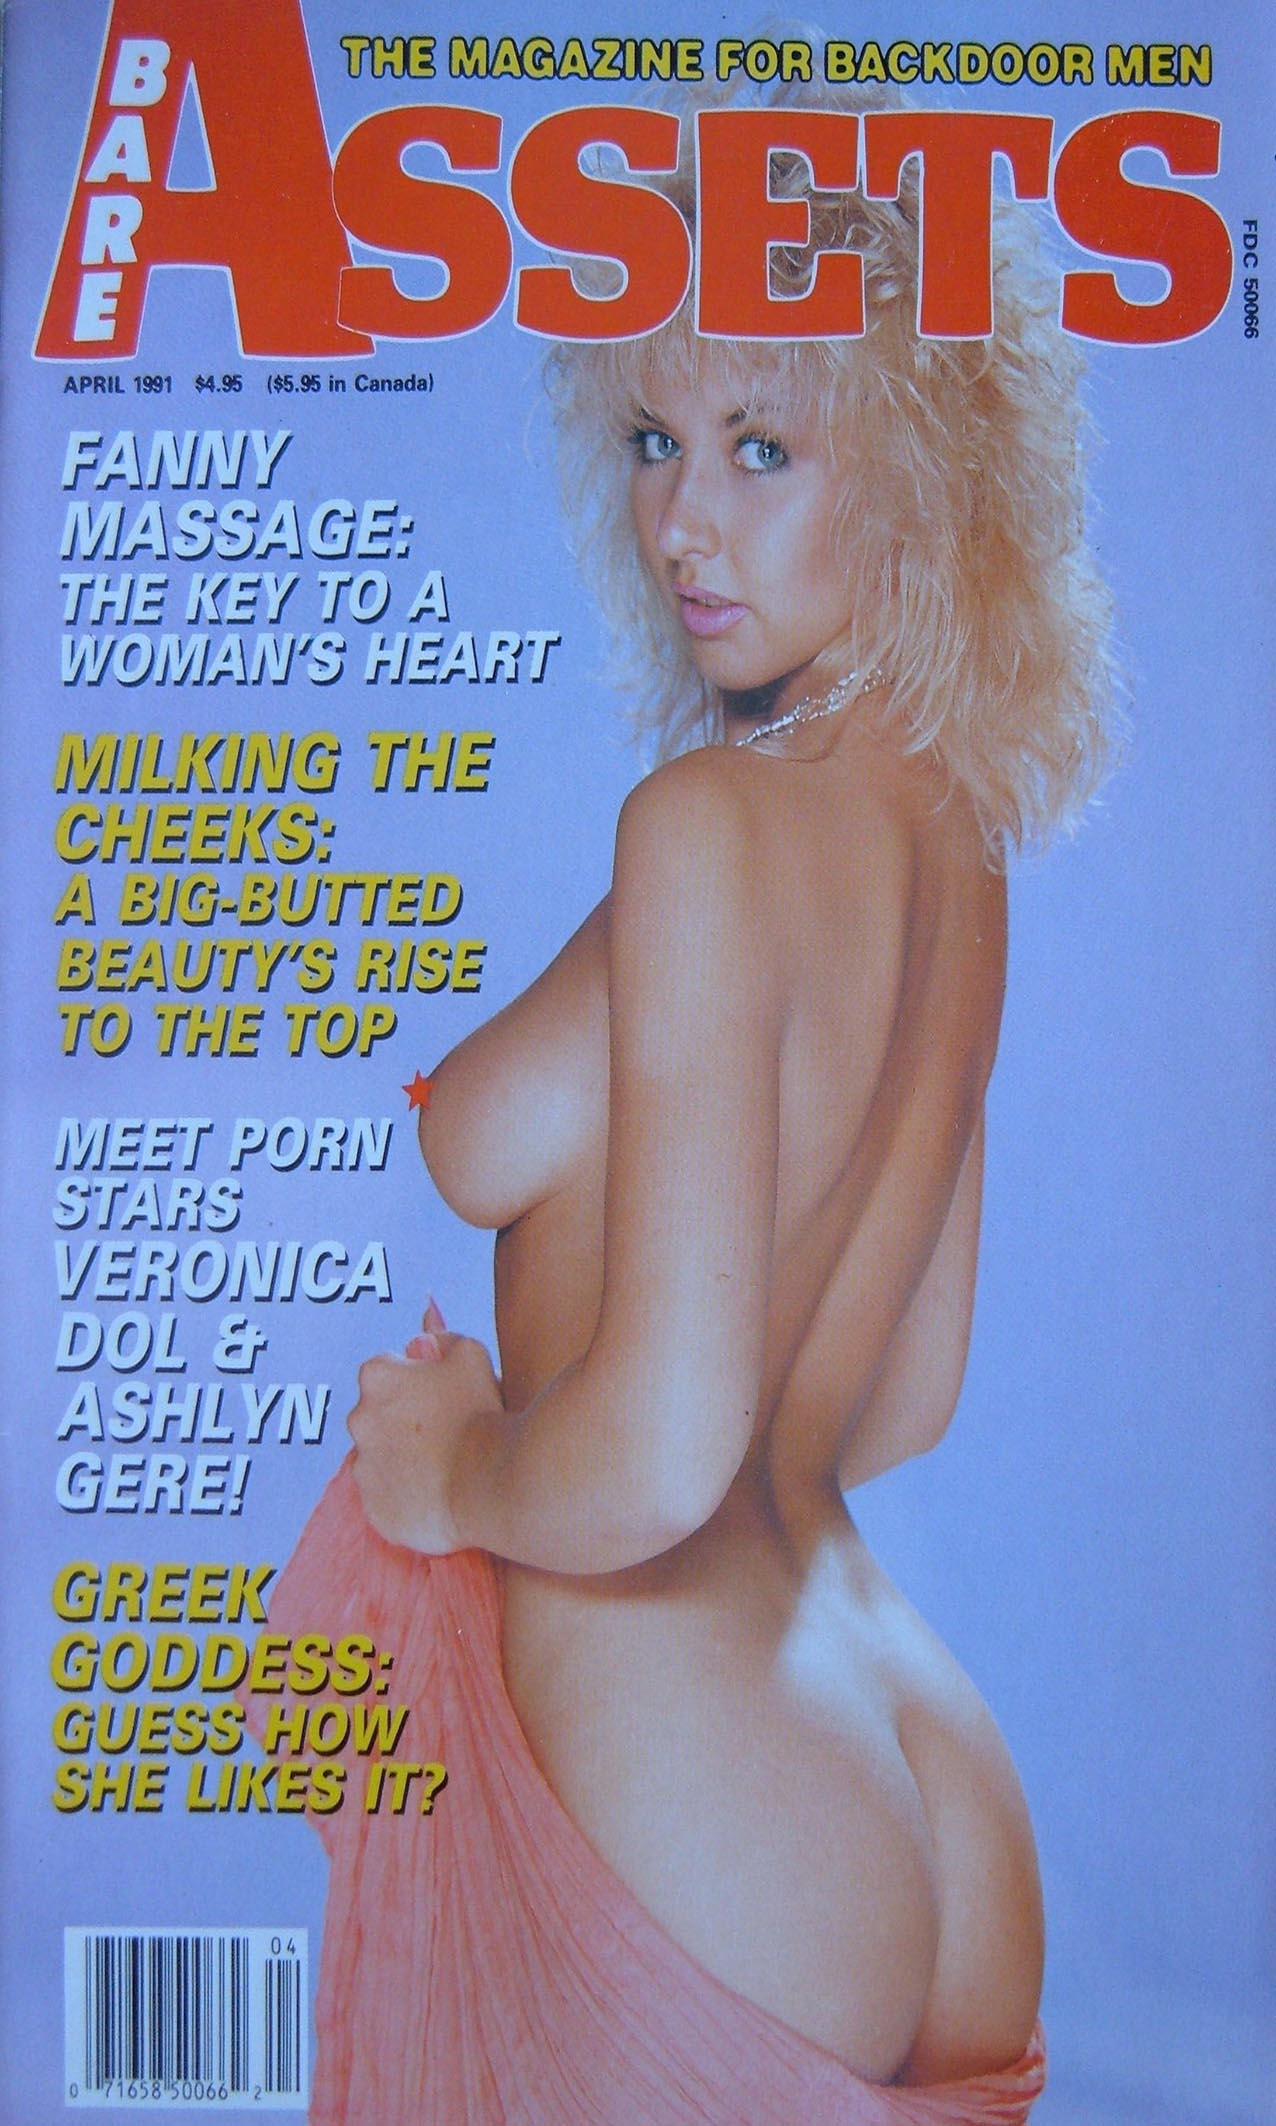 Bare Assets April 1991 magazine back issue Bare Assets magizine back copy